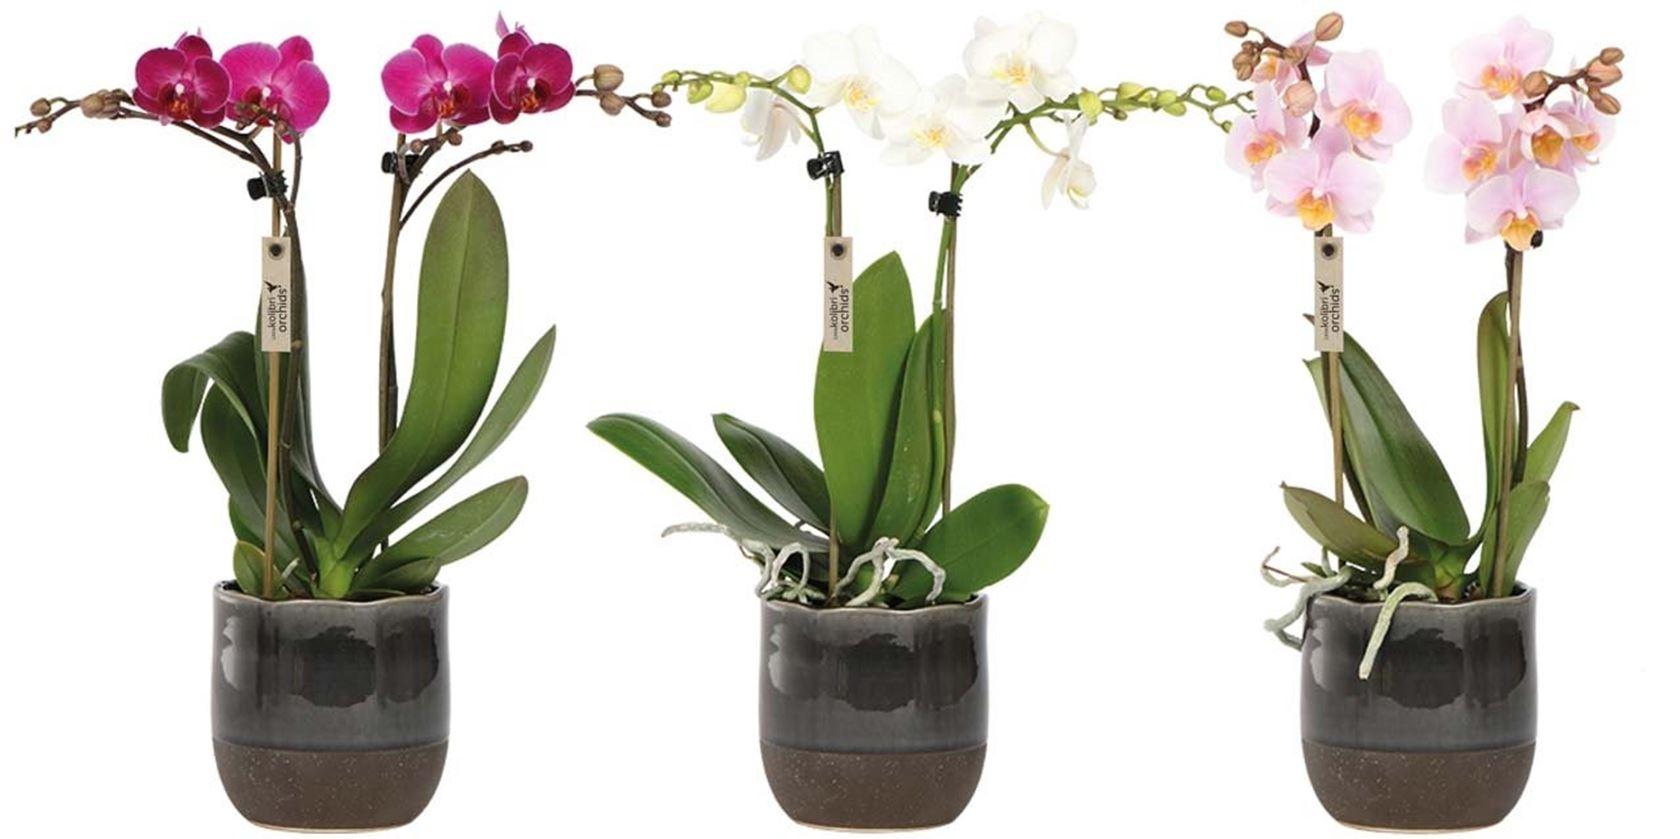 phalaenopsis little kolibri orchids 2 spike in urban pot